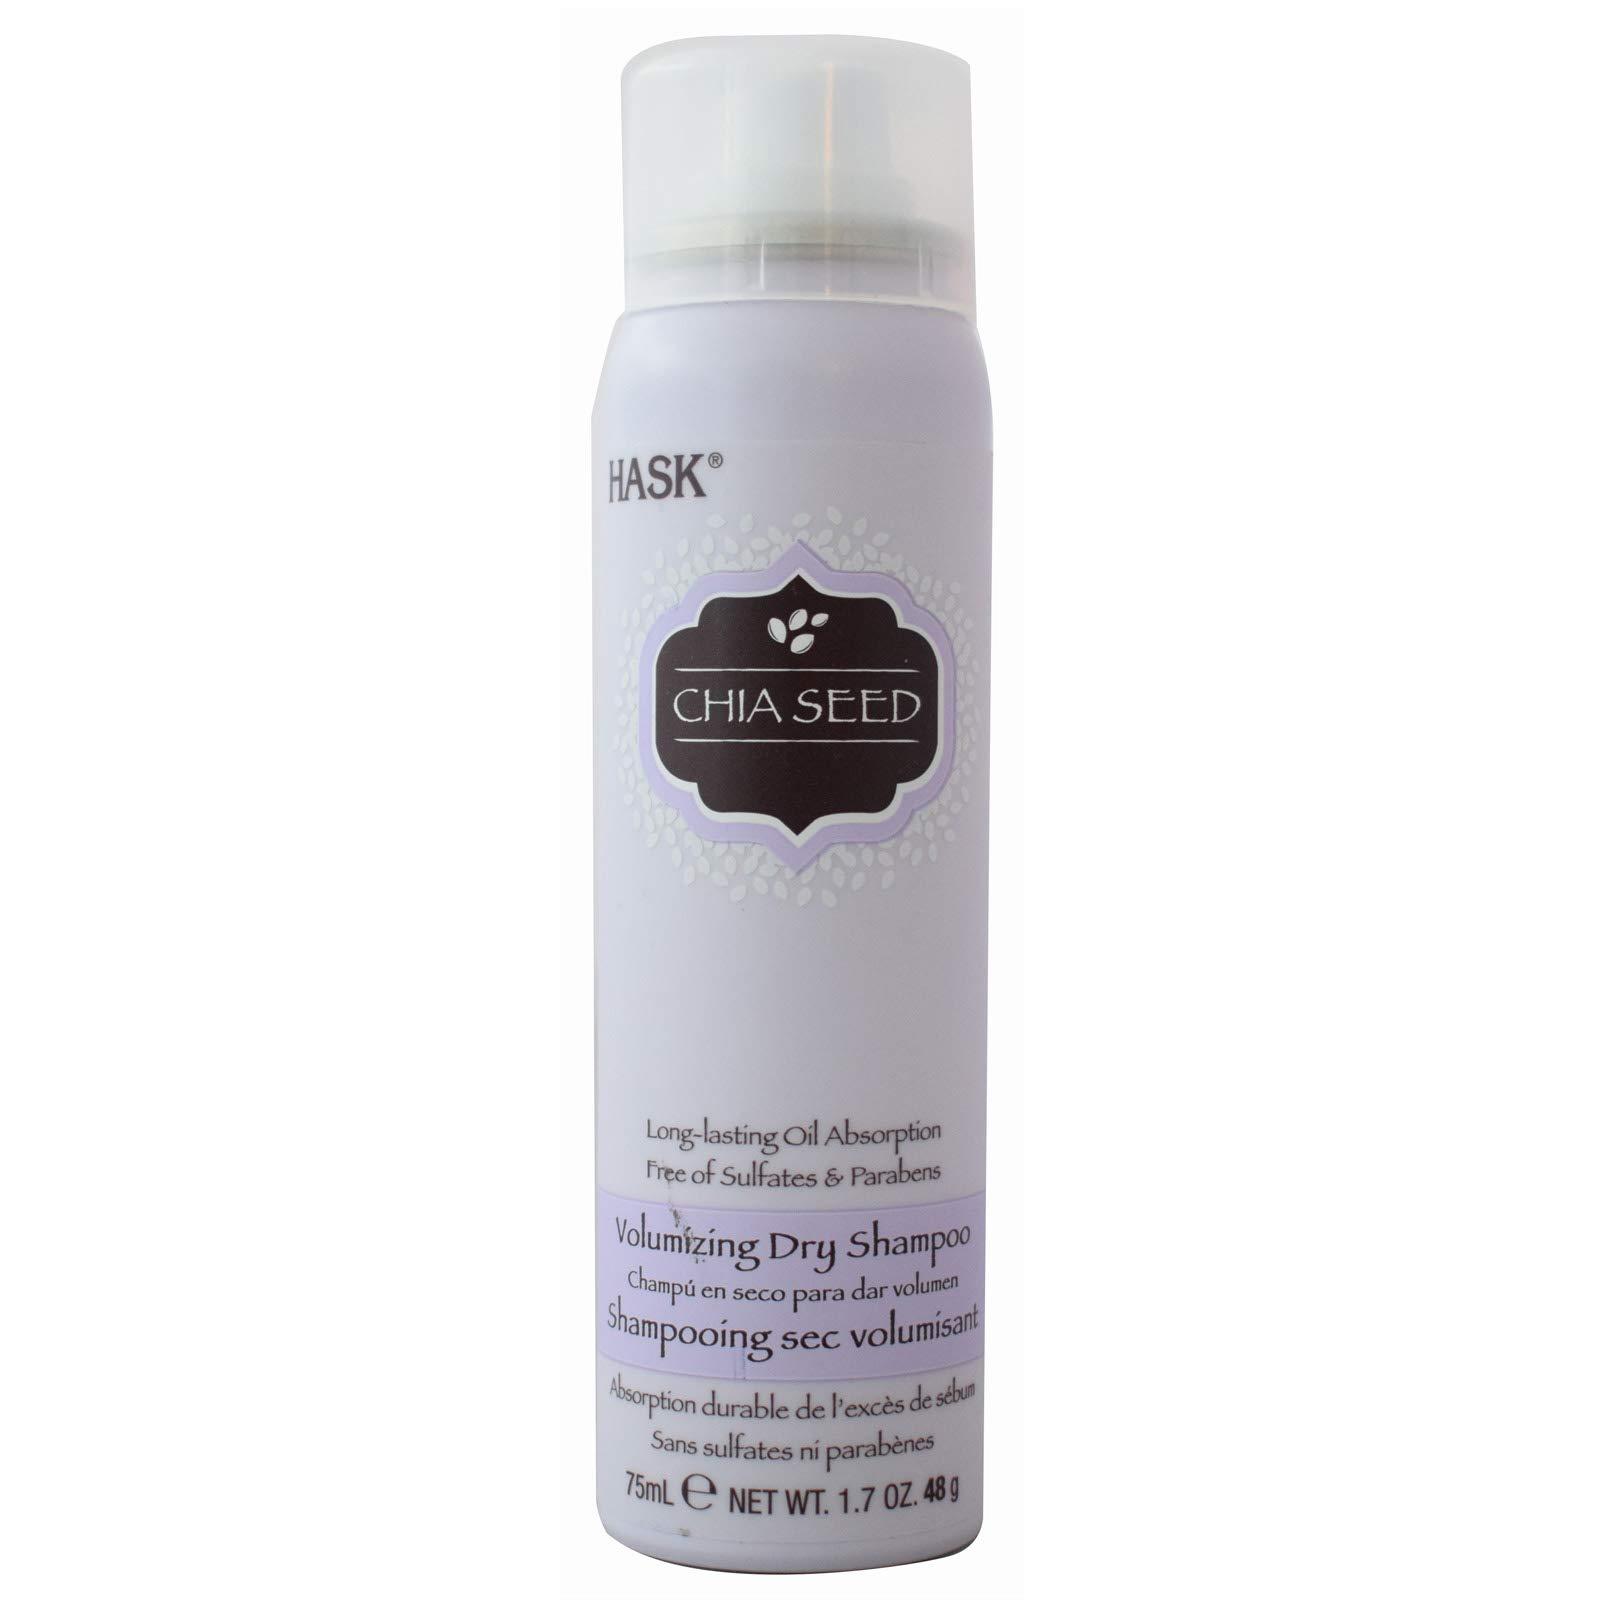 Amazon.com: Hask Shampoo Dry Chia Seed 6.5 Ounce (192ml